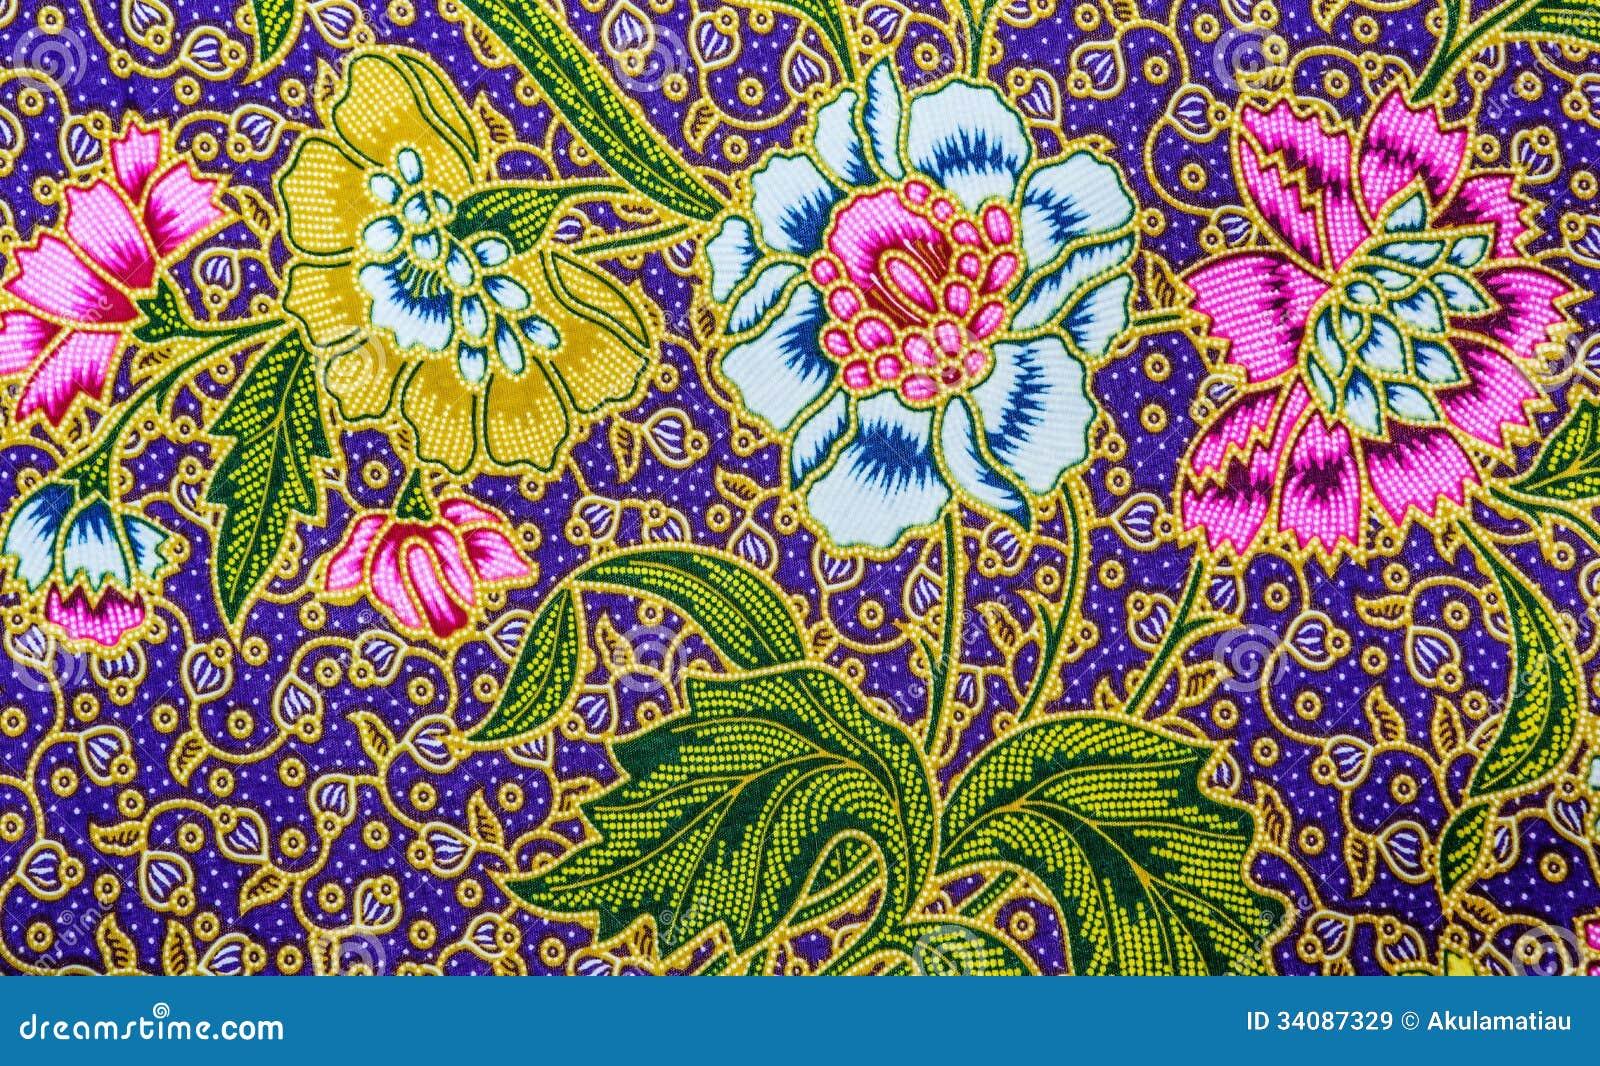 Malaysia Batik Pattern VII Royalty Free Stock Images - Image: 34087329